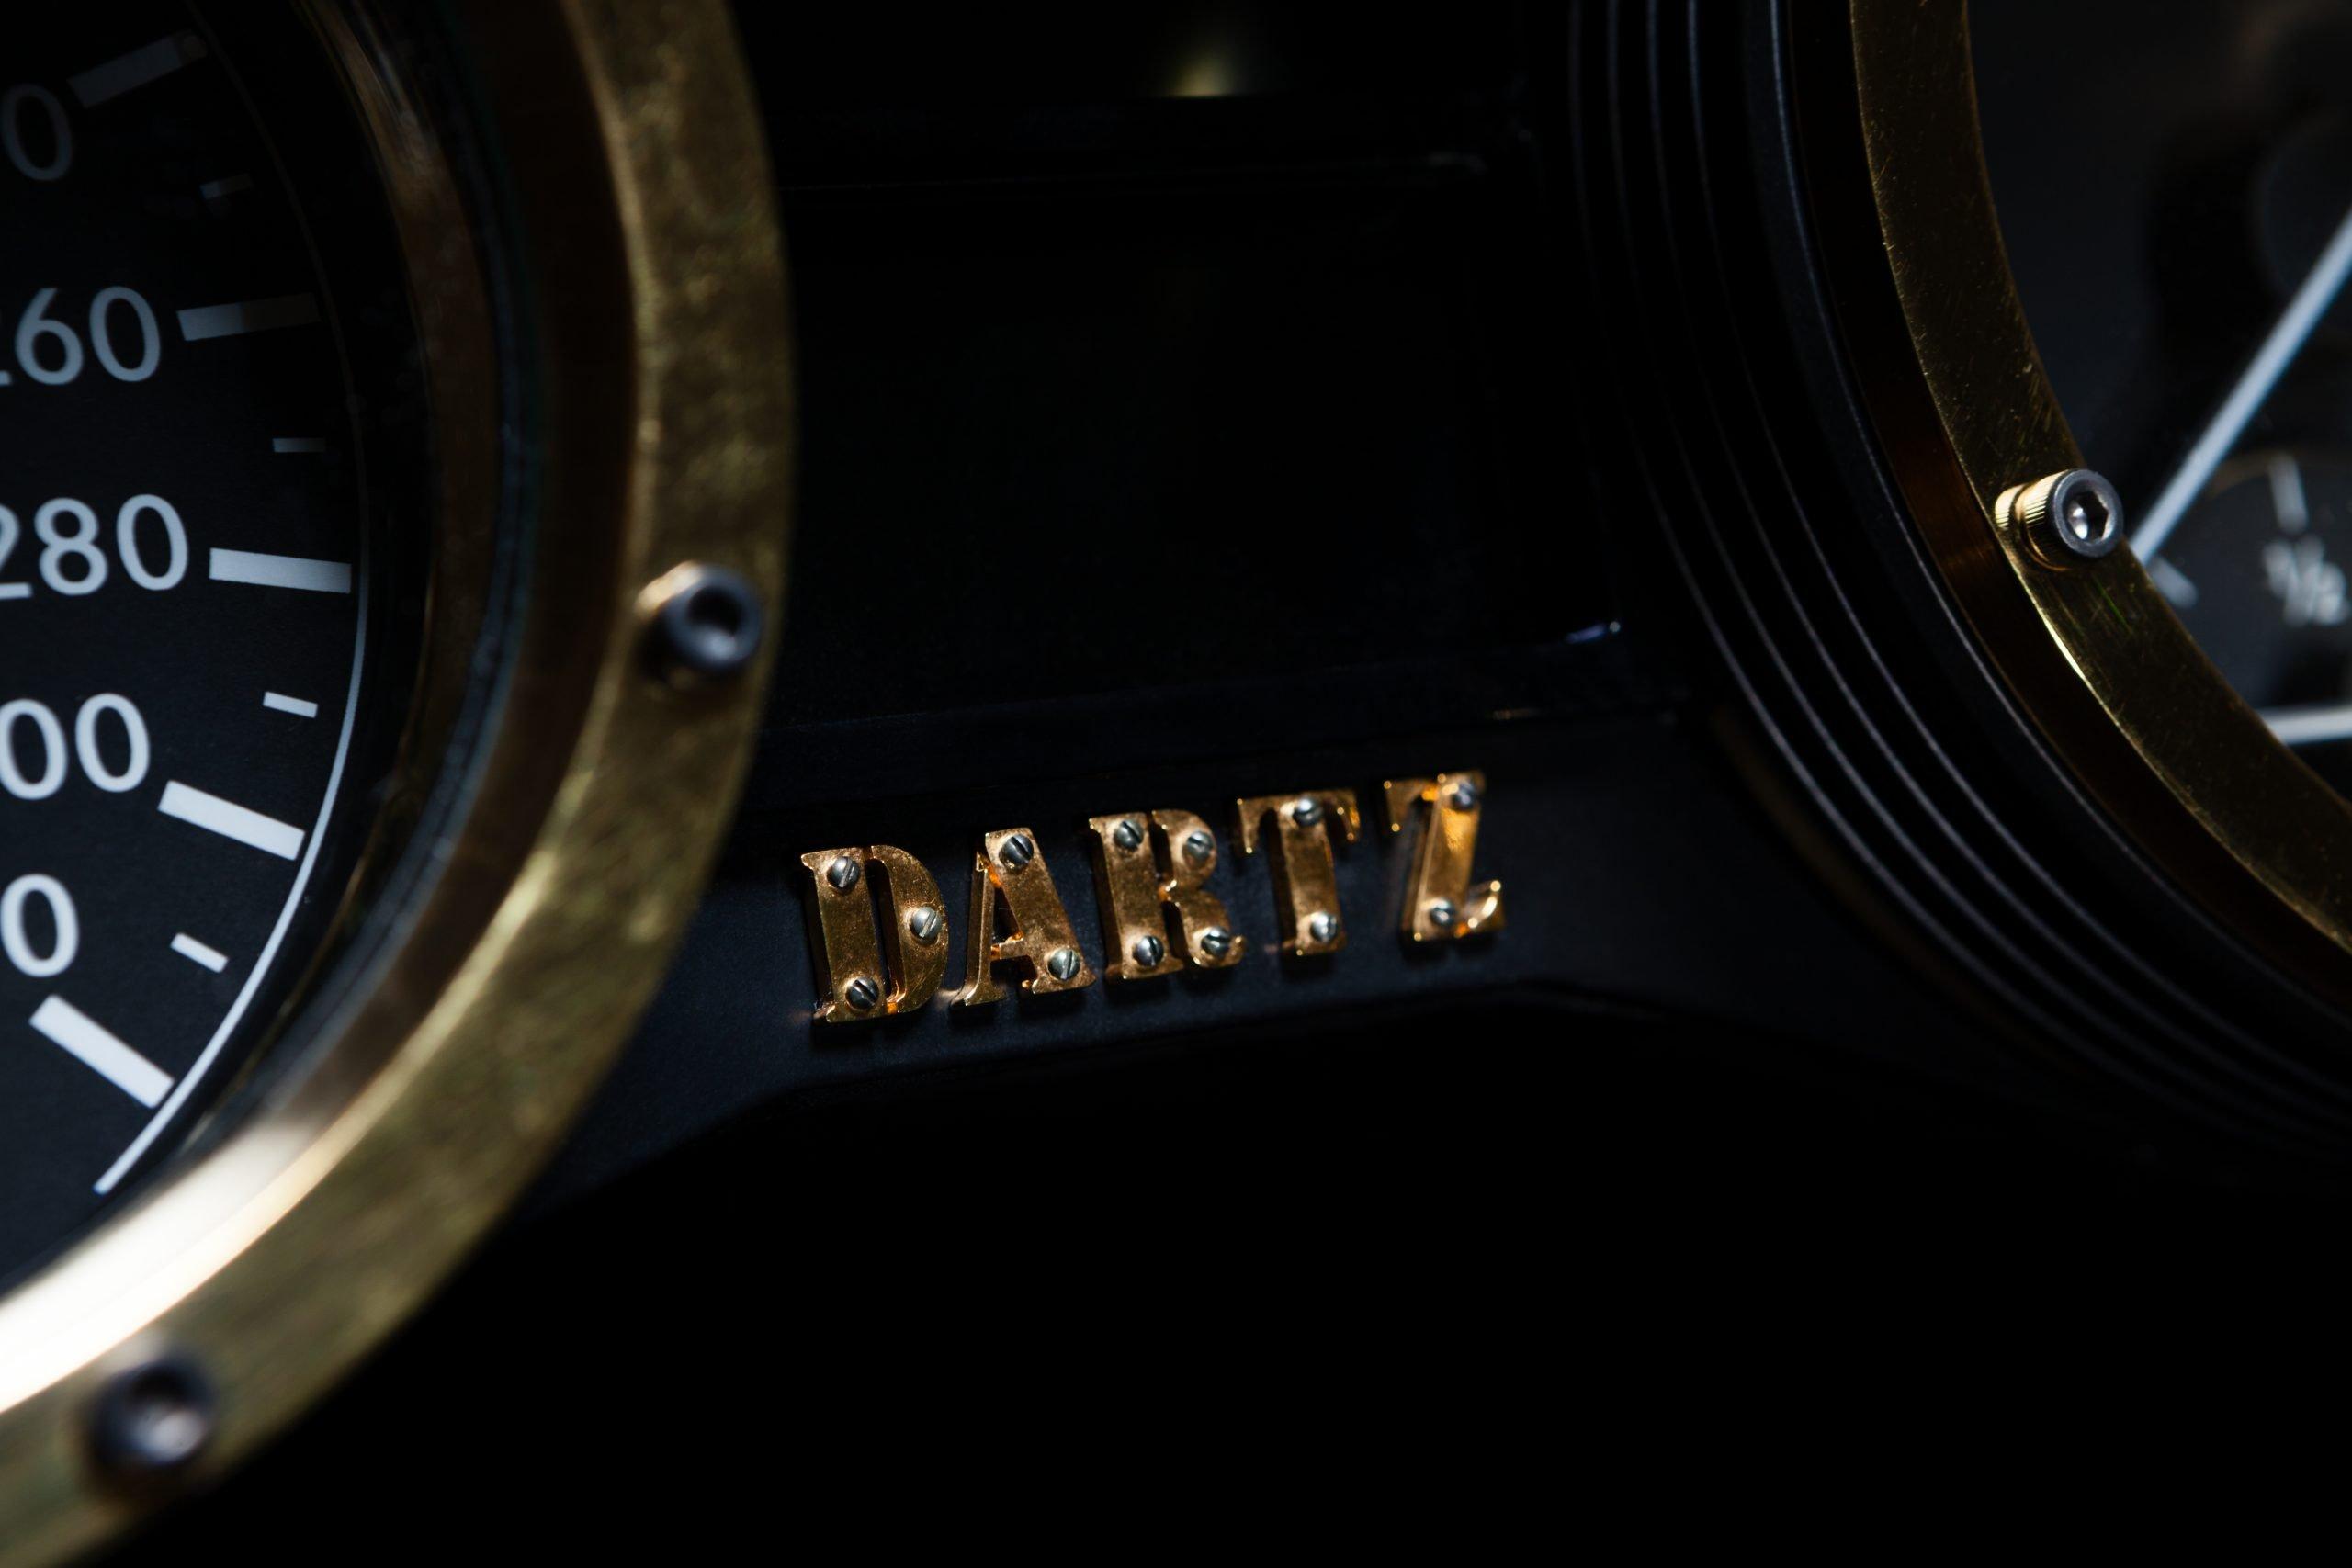 DARTZ_Promrbon_Black_Alligator_dash_1